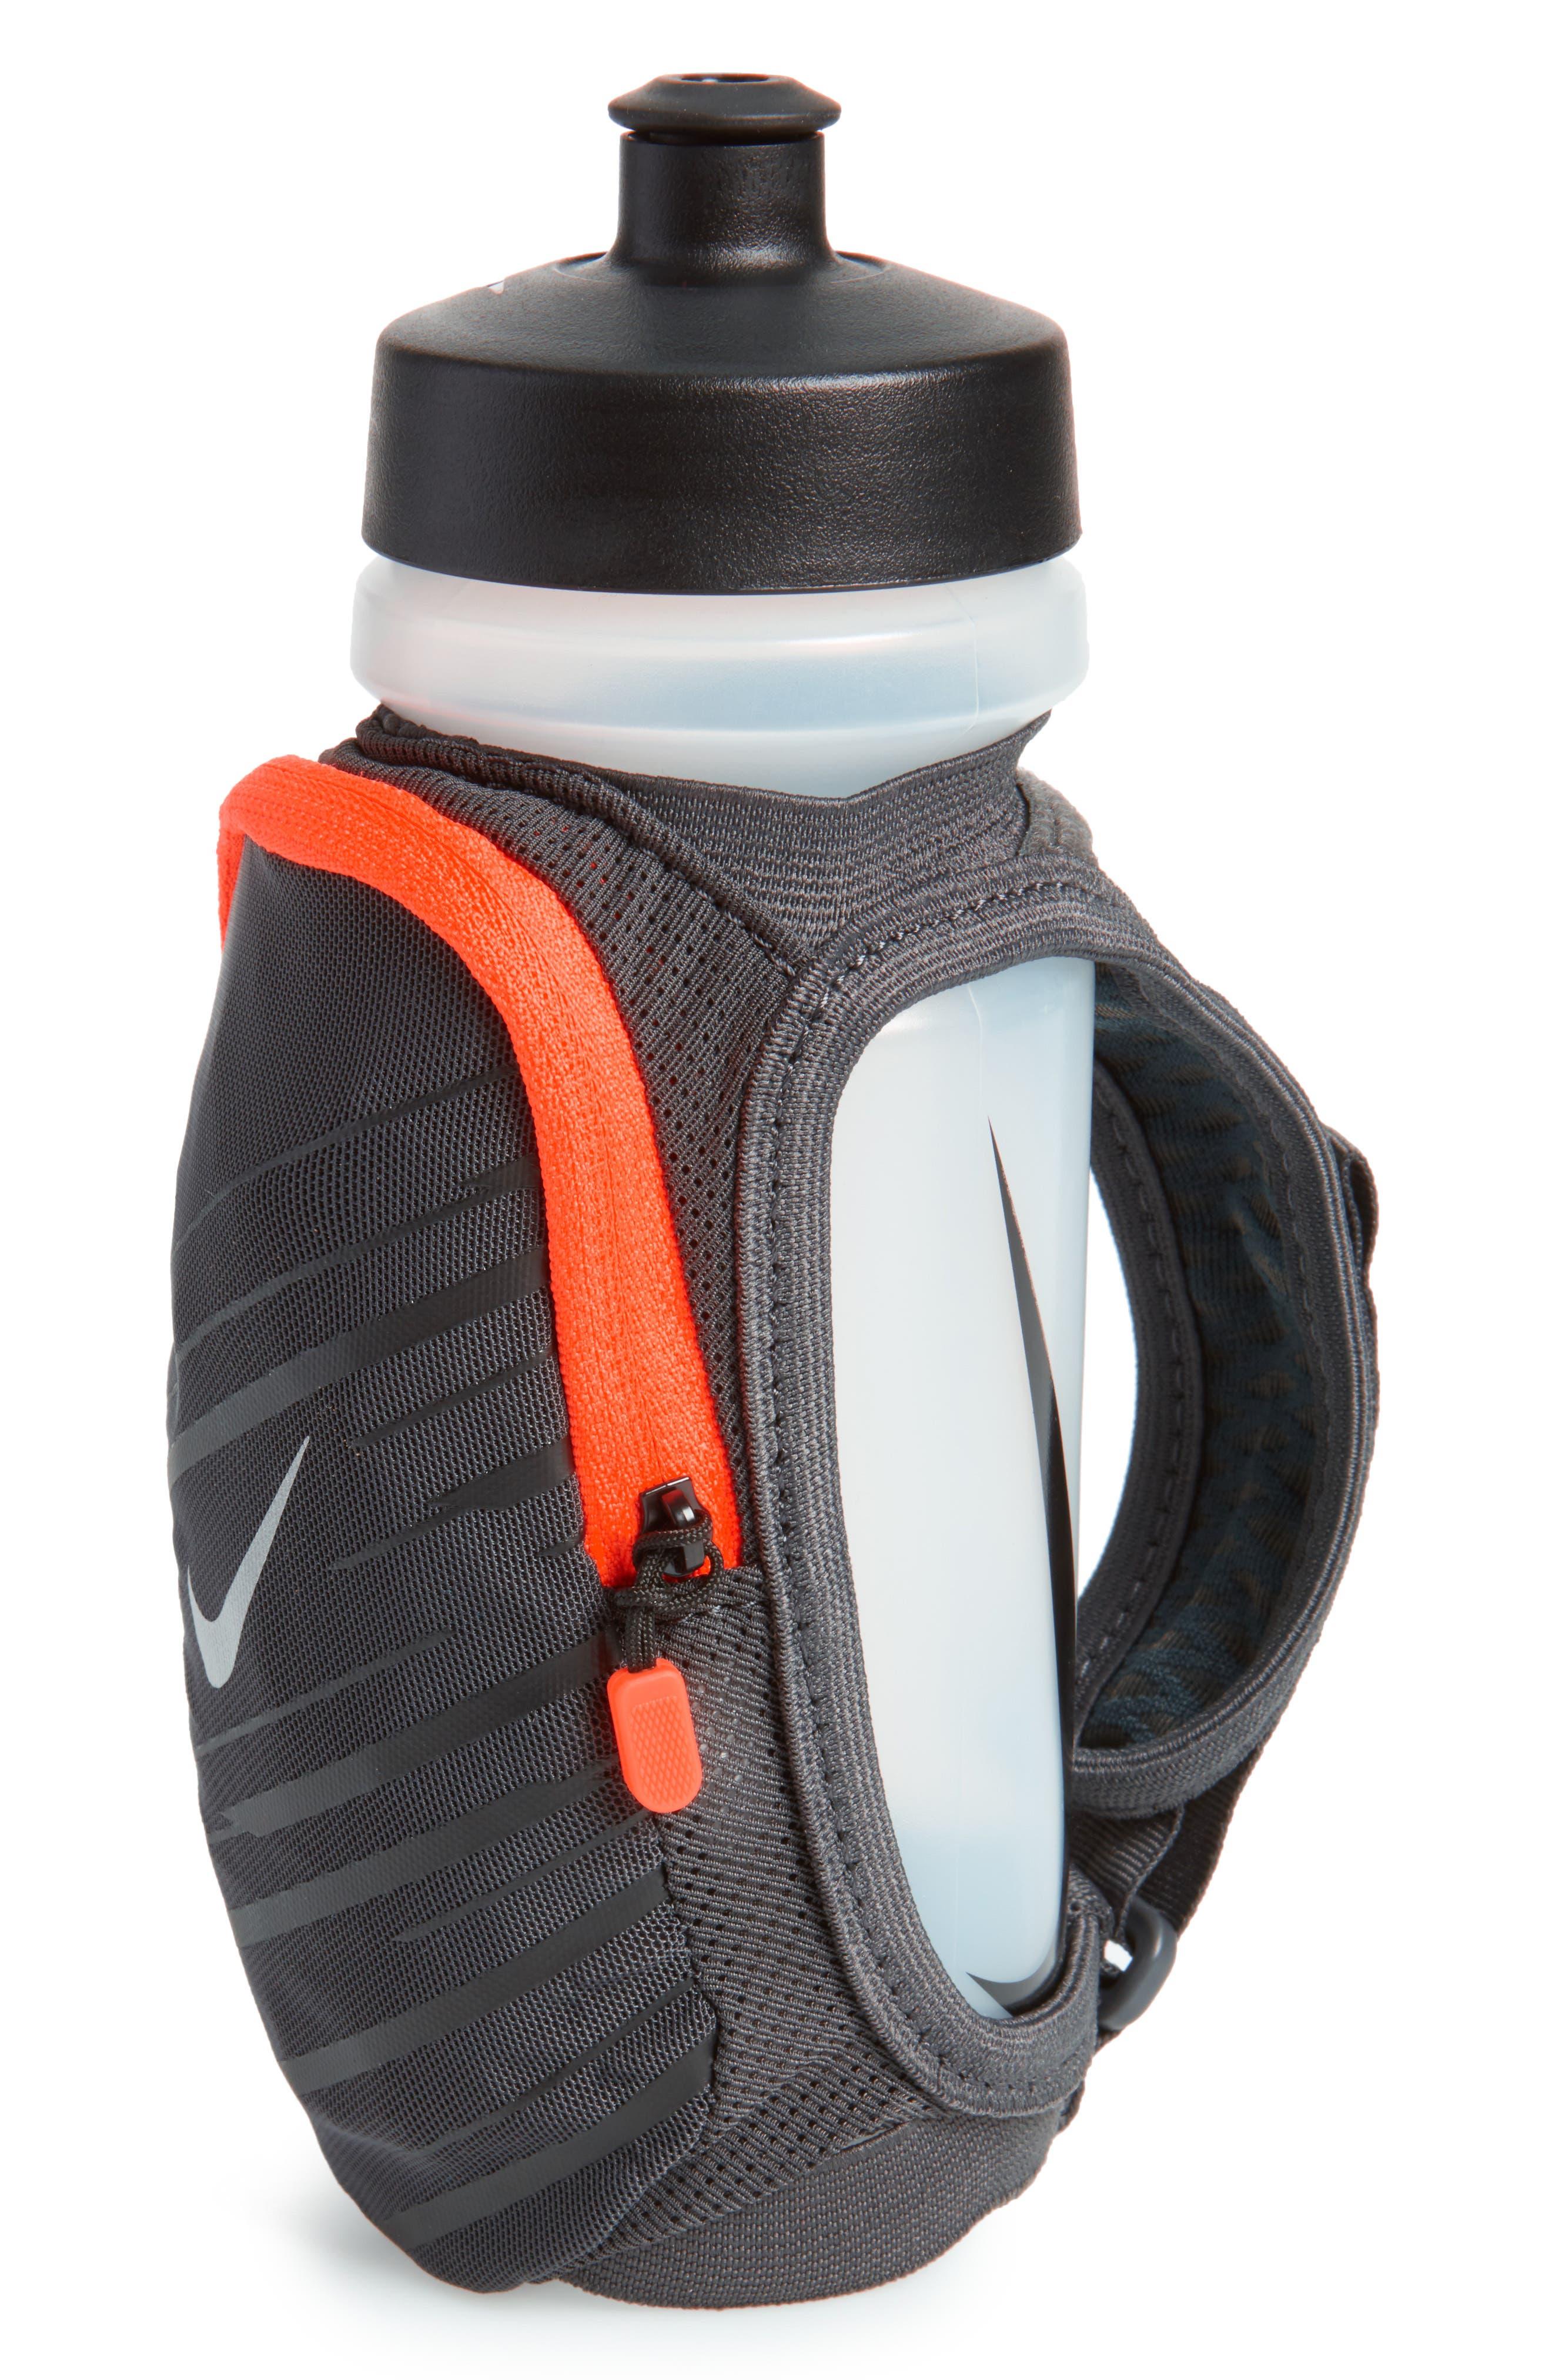 Alternate Image 1 Selected - Nike Handheld Water Bottle Strap